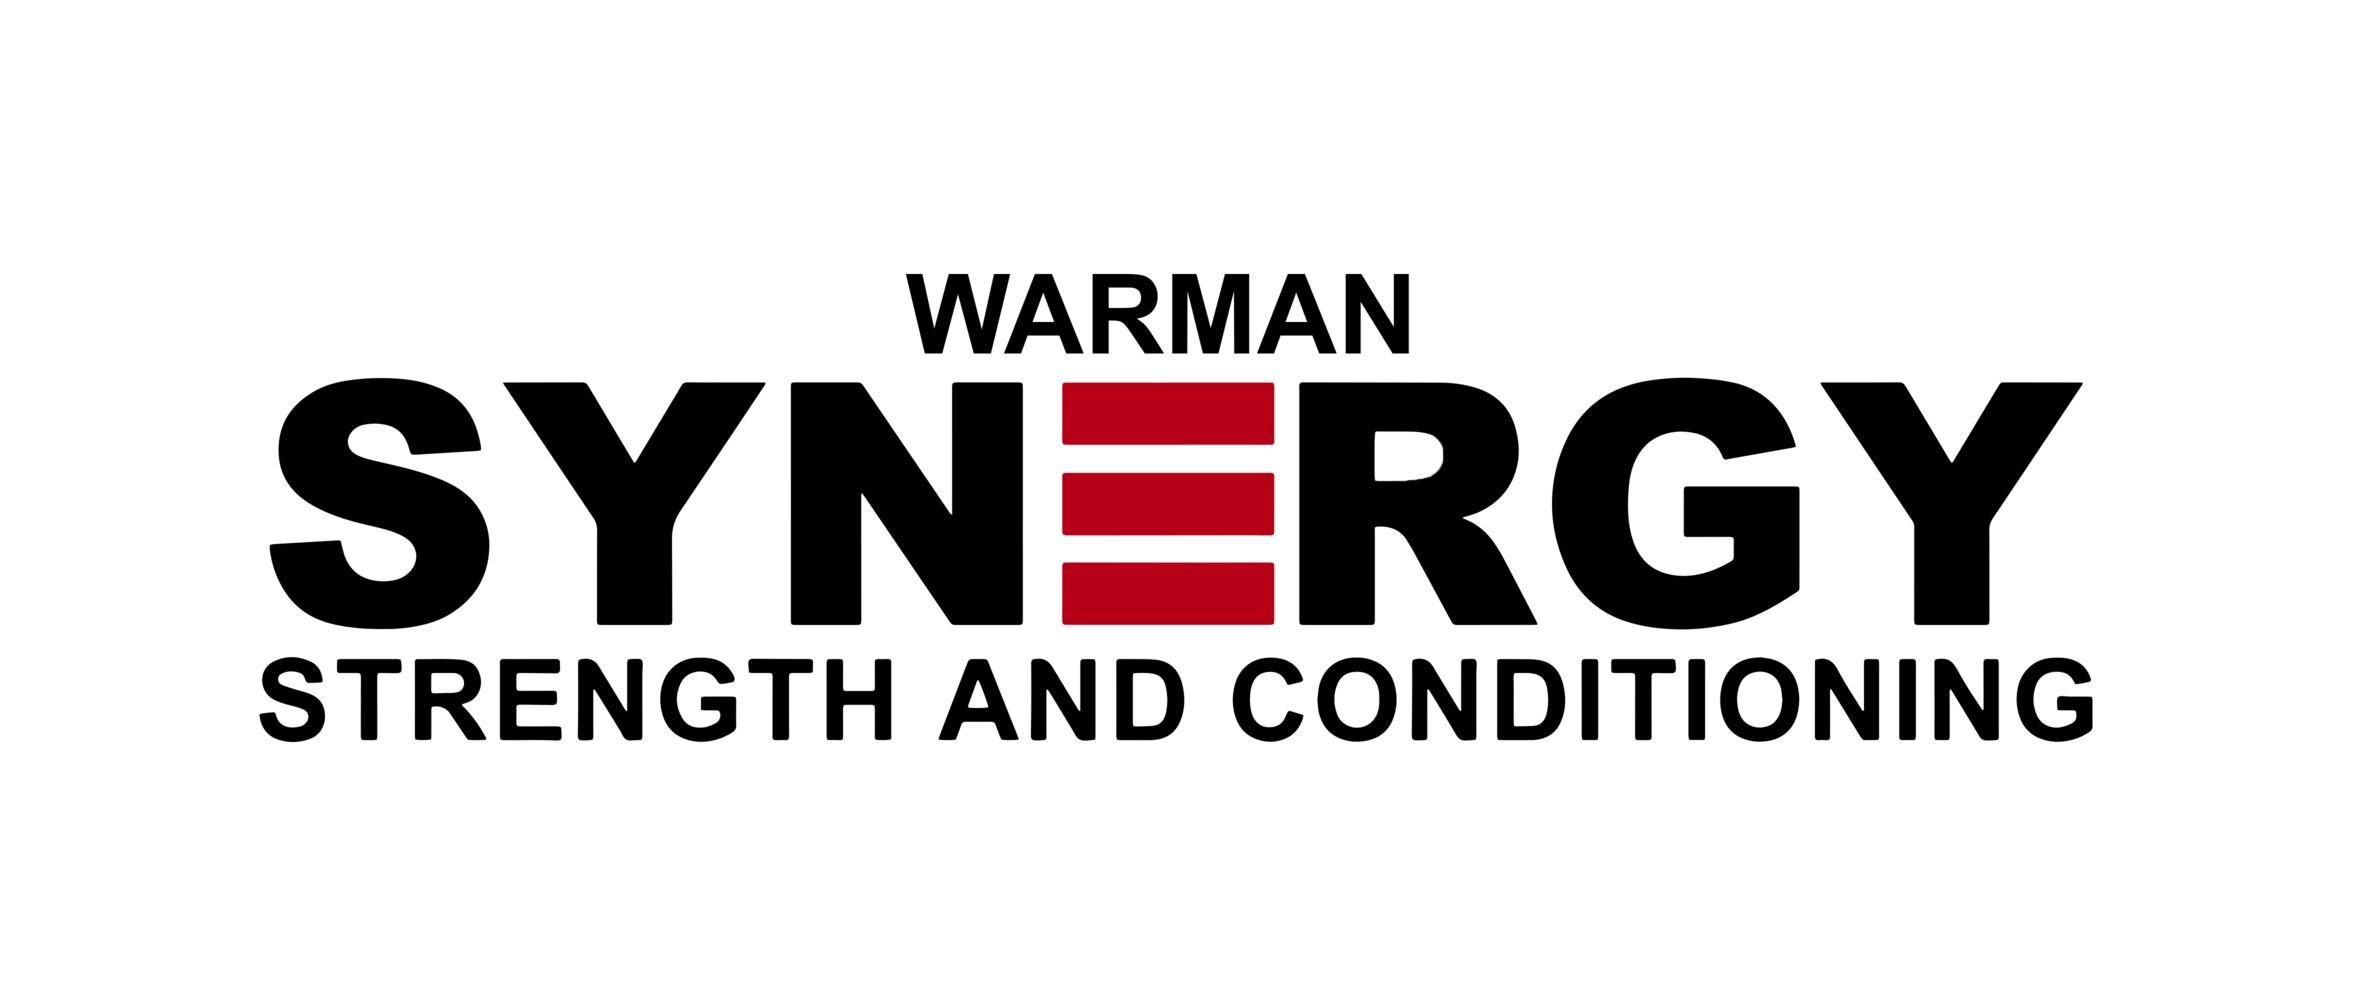 Synergy_Warman_Black.jpg